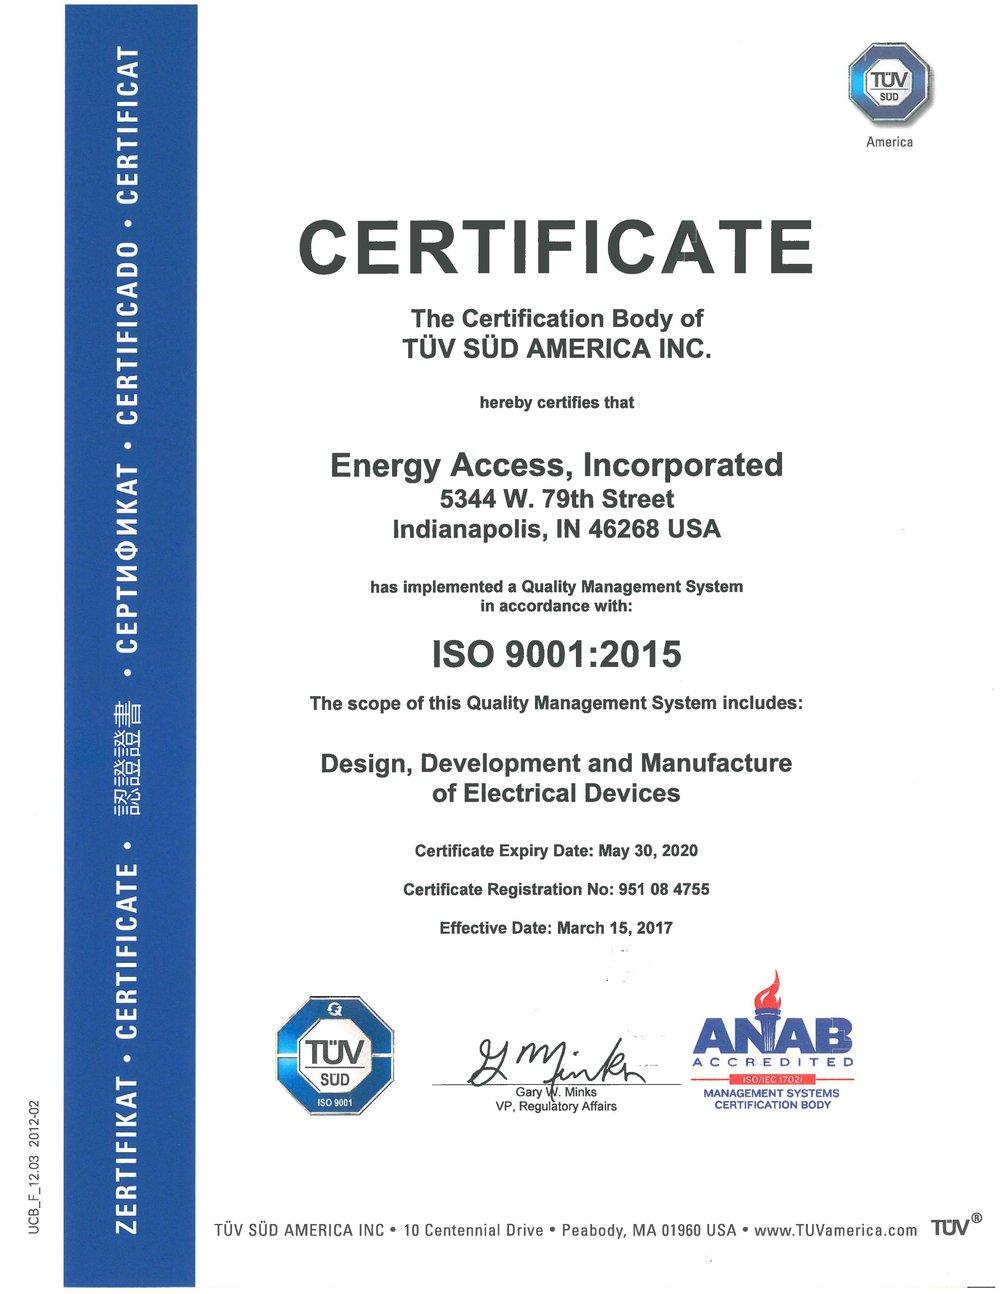 EnergyAccessISO90012015.jpg